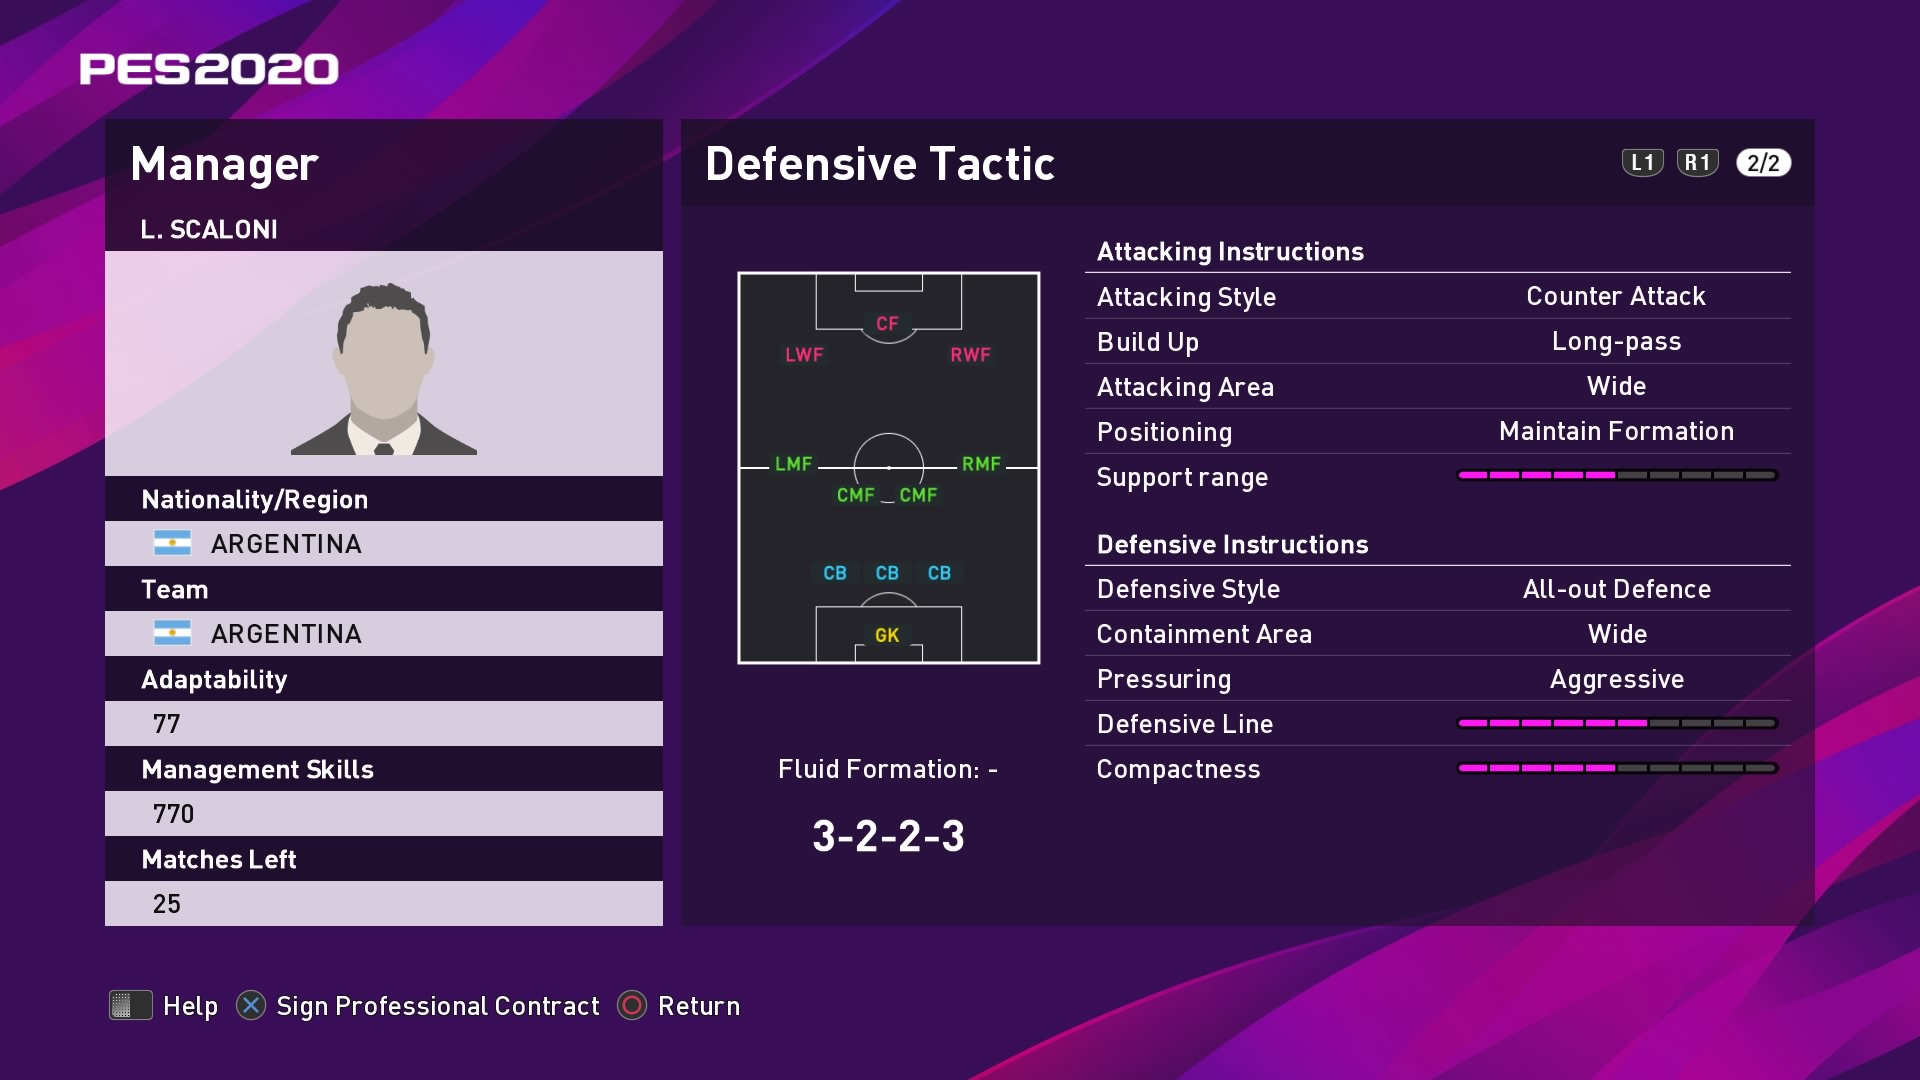 L. Scaloni ( Lionel Scaloni) Defensive Tactic in PES 2020 myClub